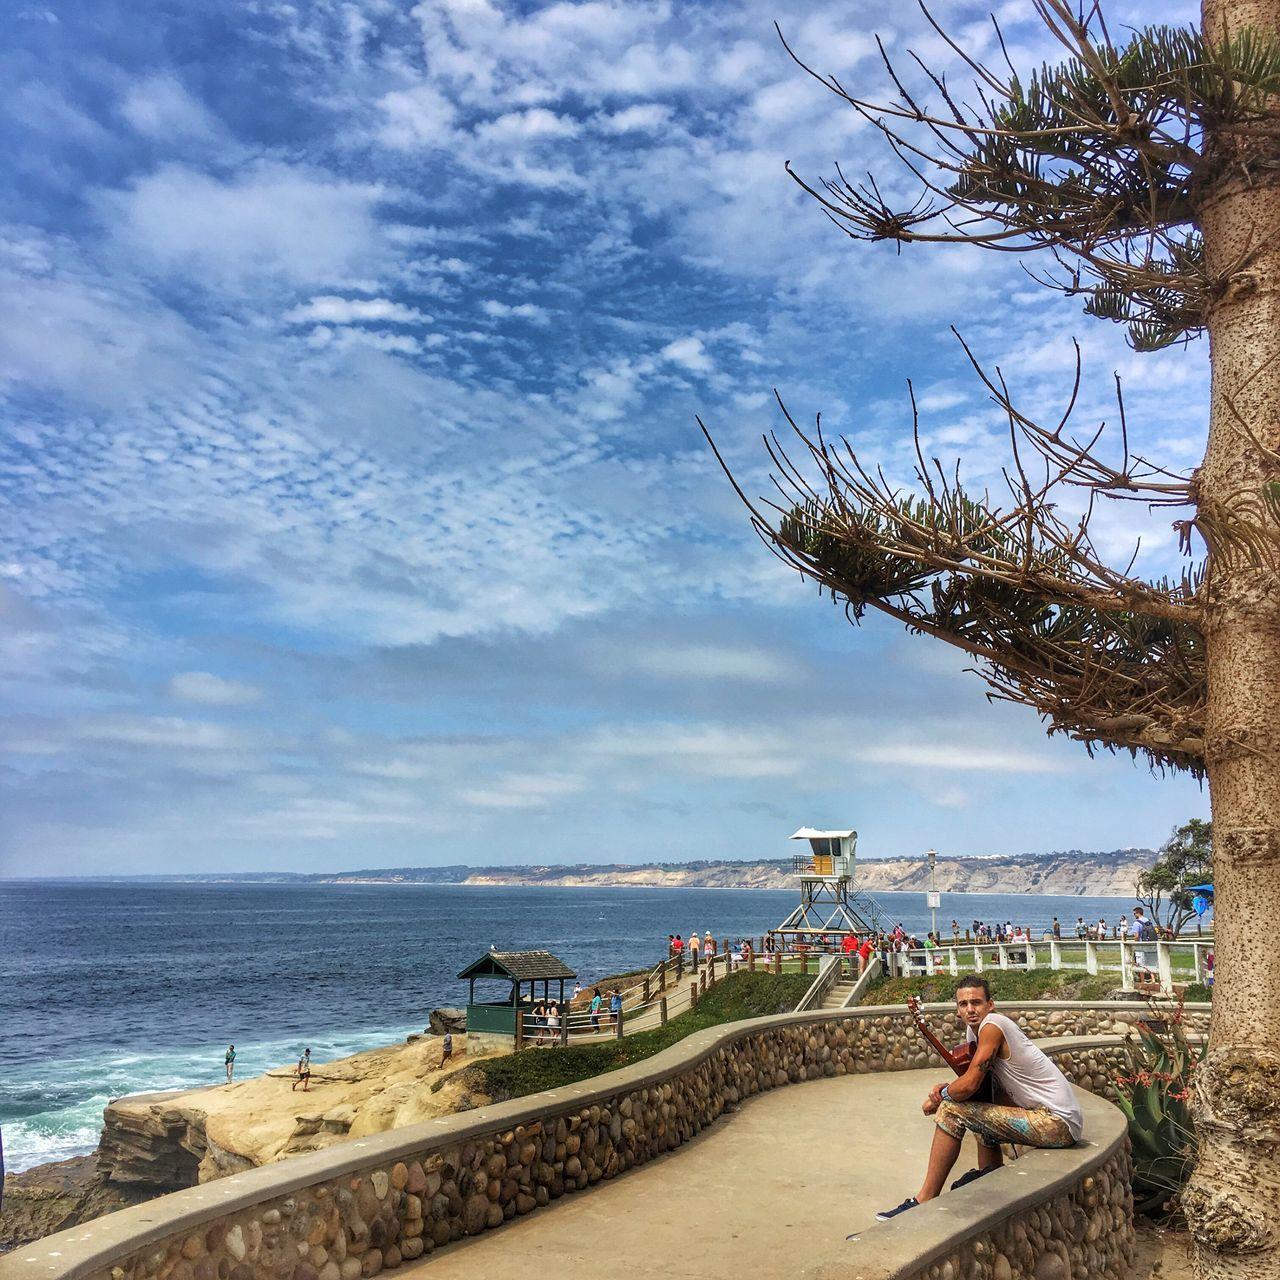 La Jolla-The Jewel of San Diego Sea Sky Vacations Travel Destinations Tranquility Coastline Beach